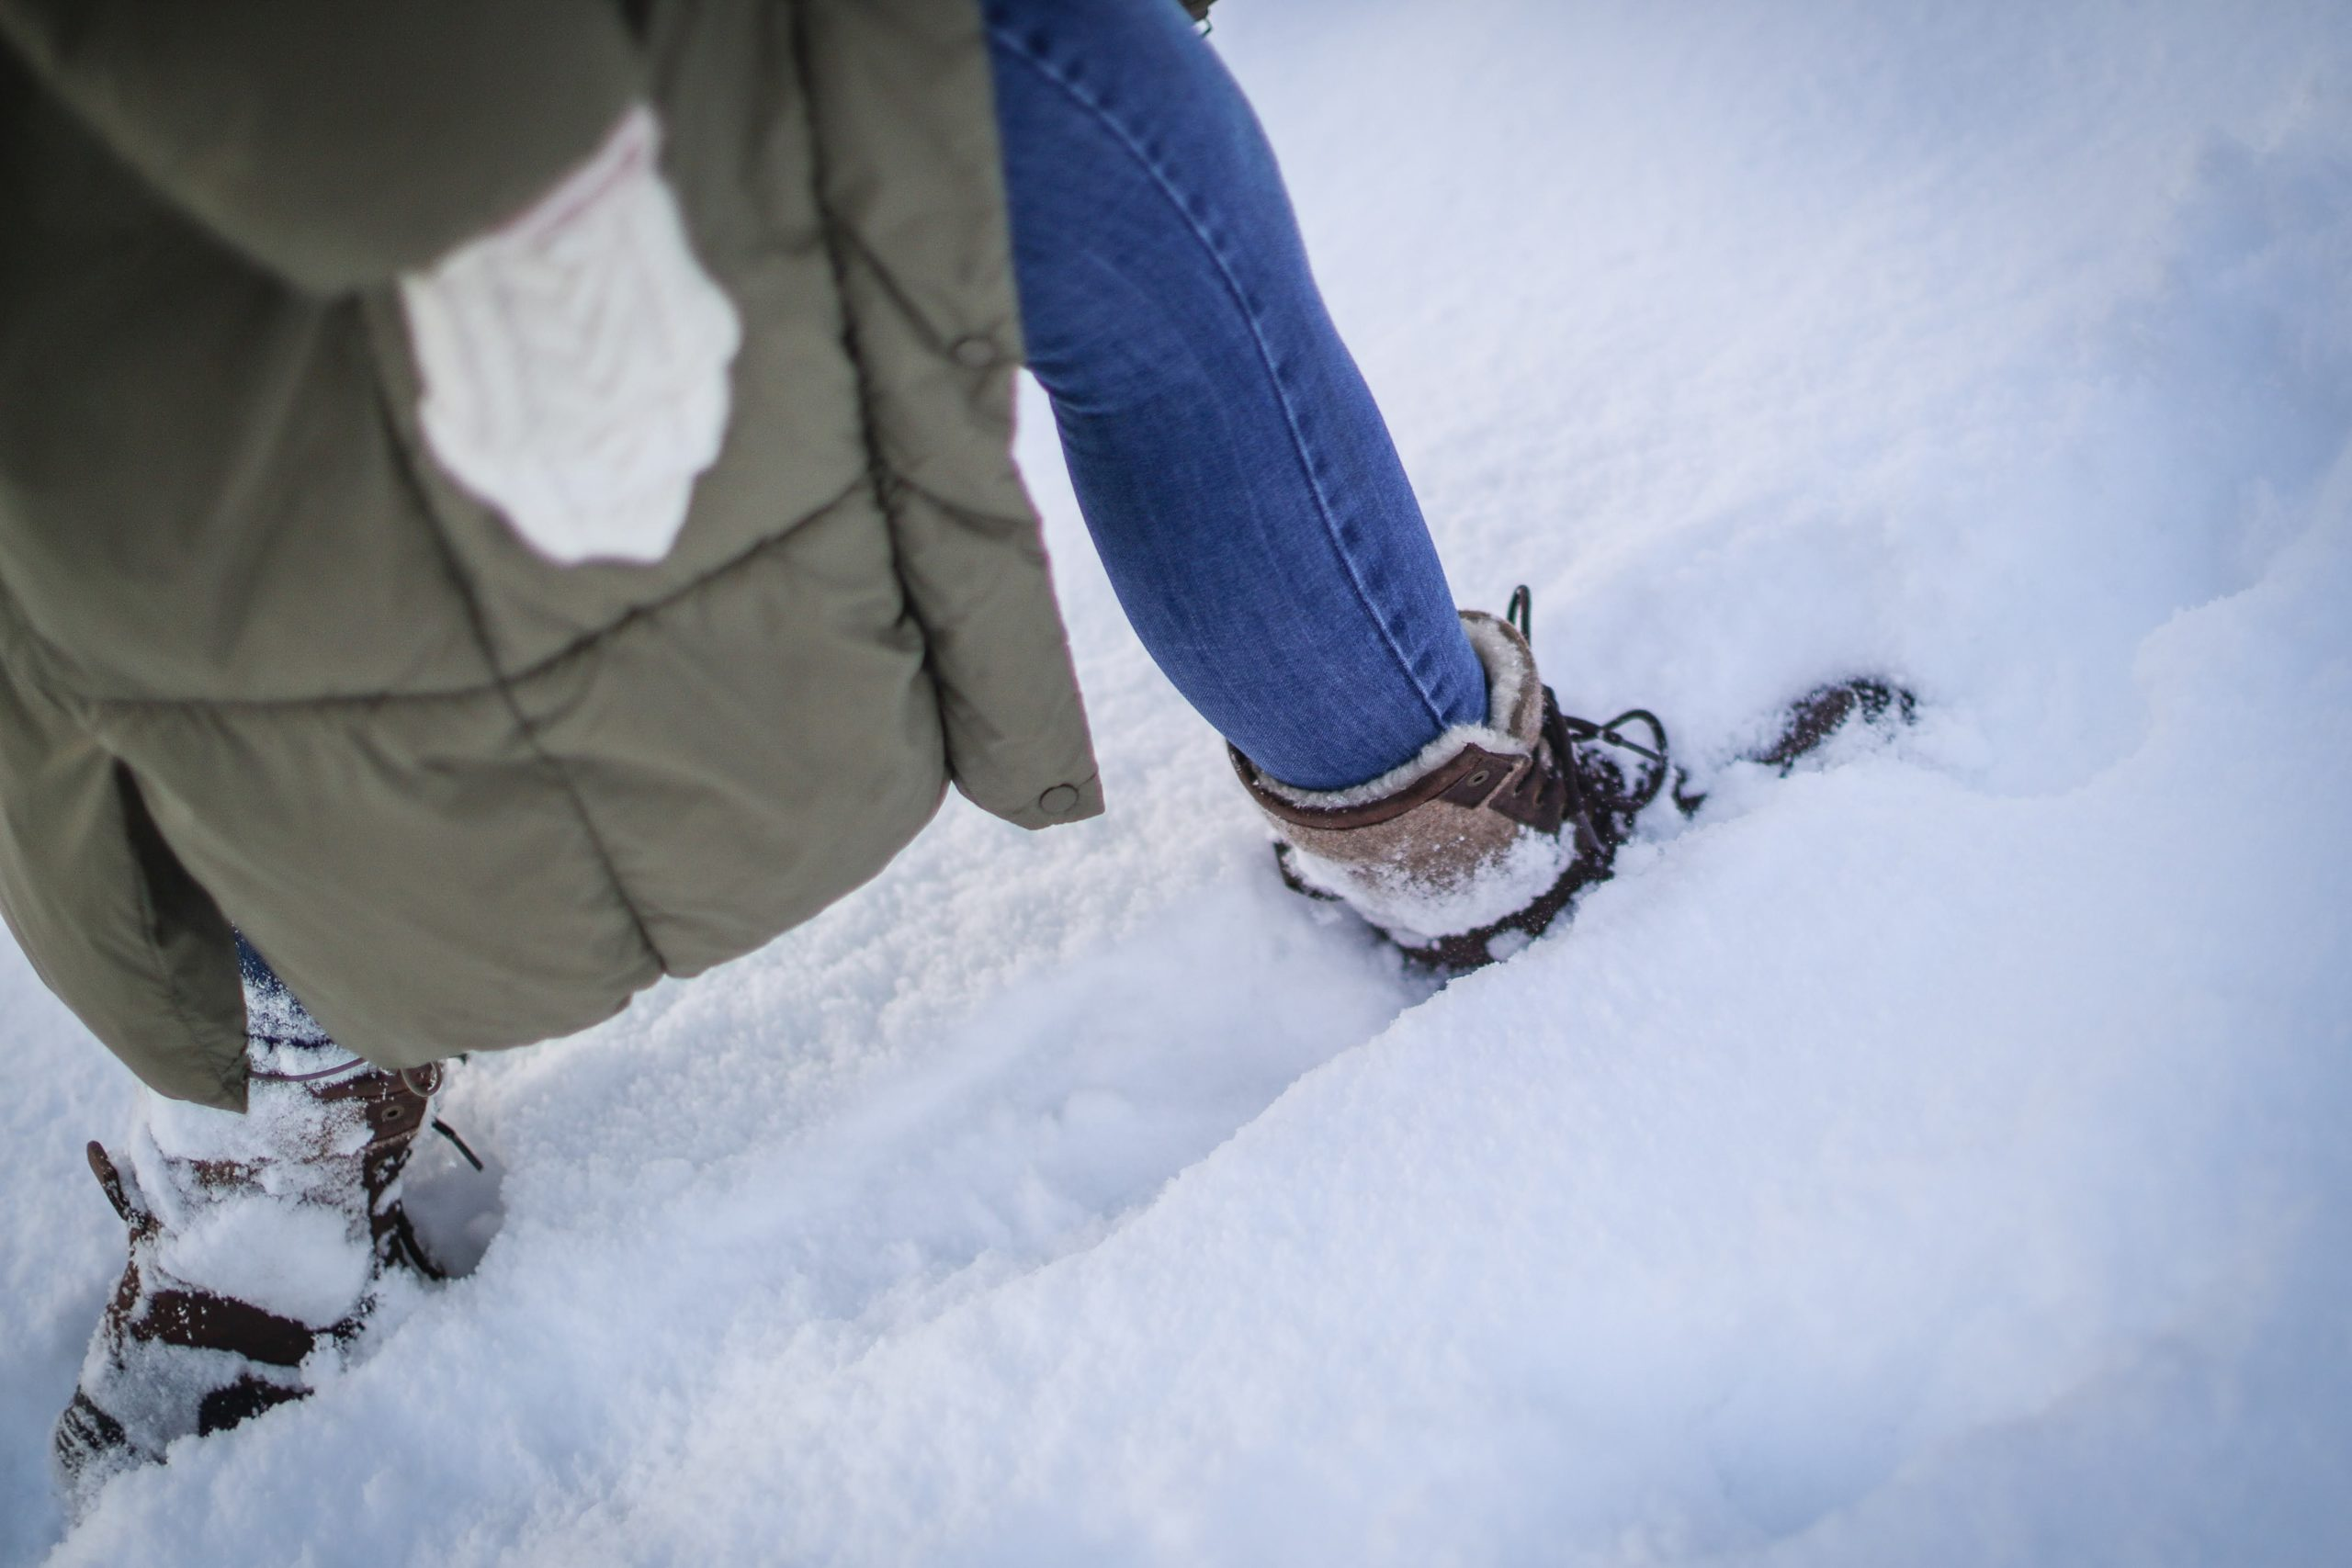 snow walk boots